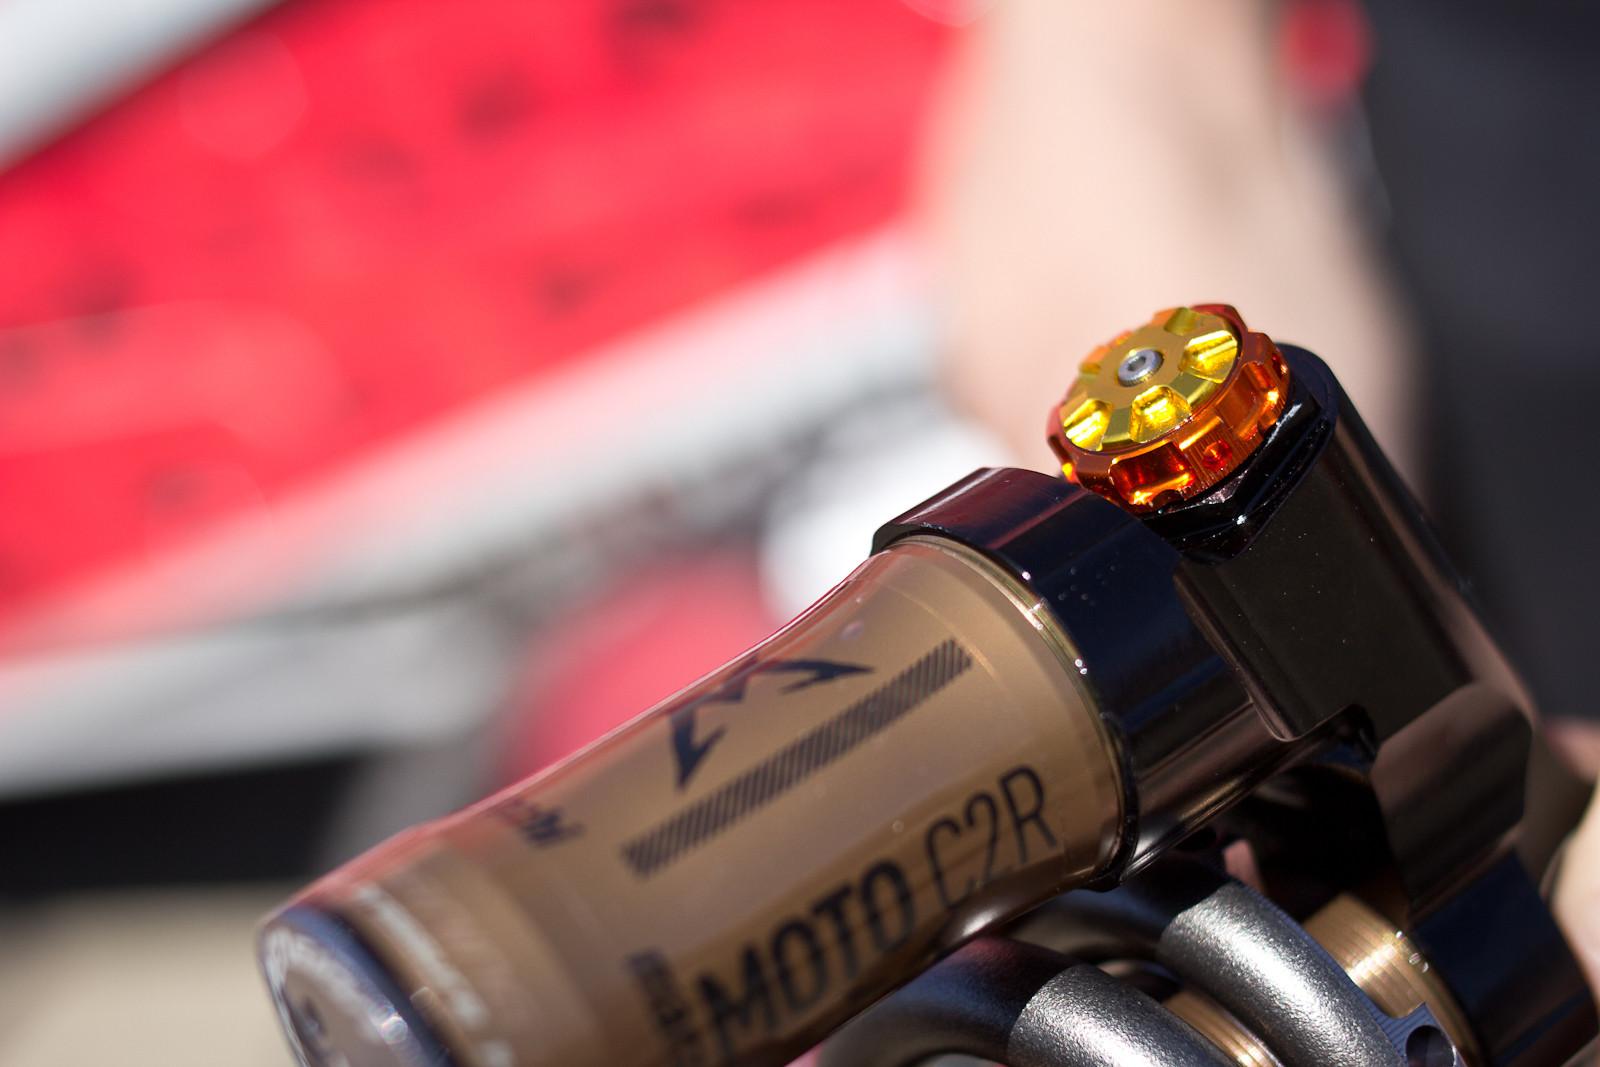 Marzocchi Moto C2R Shock - Sea Otter Classic - 2013 Sea Otter Classic Pit Bits - 1st Edition - Mountain Biking Pictures - Vital MTB